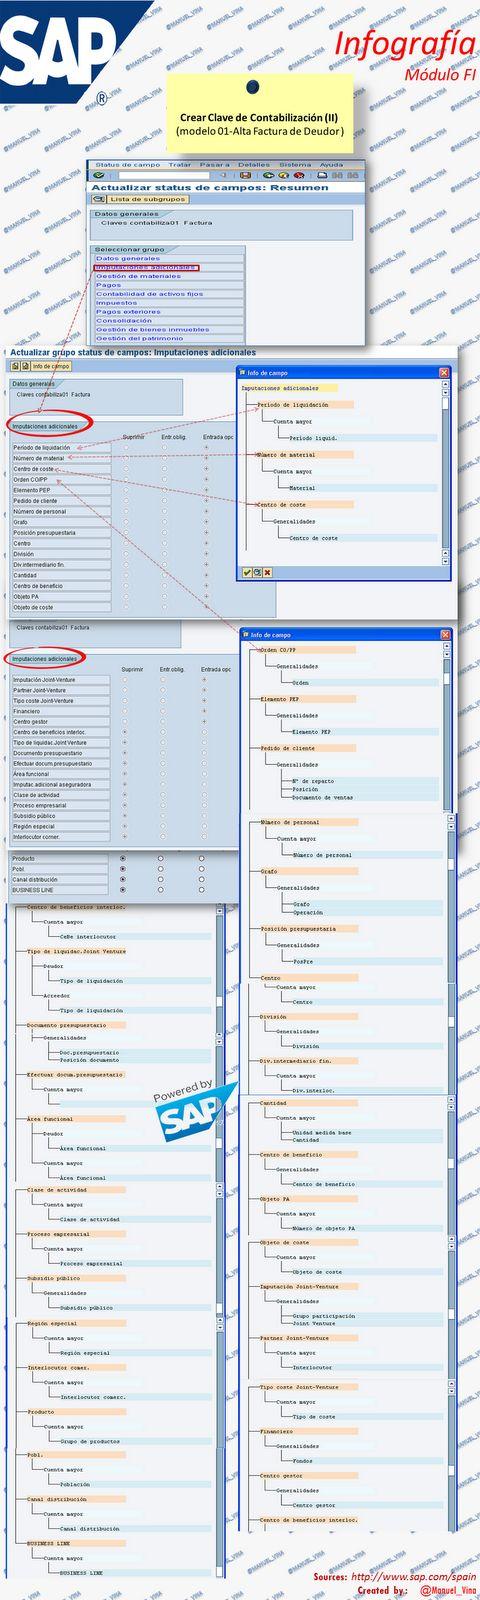 |22| #Infografía sobre #Sap-Fi Crear Clave de Contabilización (II) | Notas prácticas de gestión.